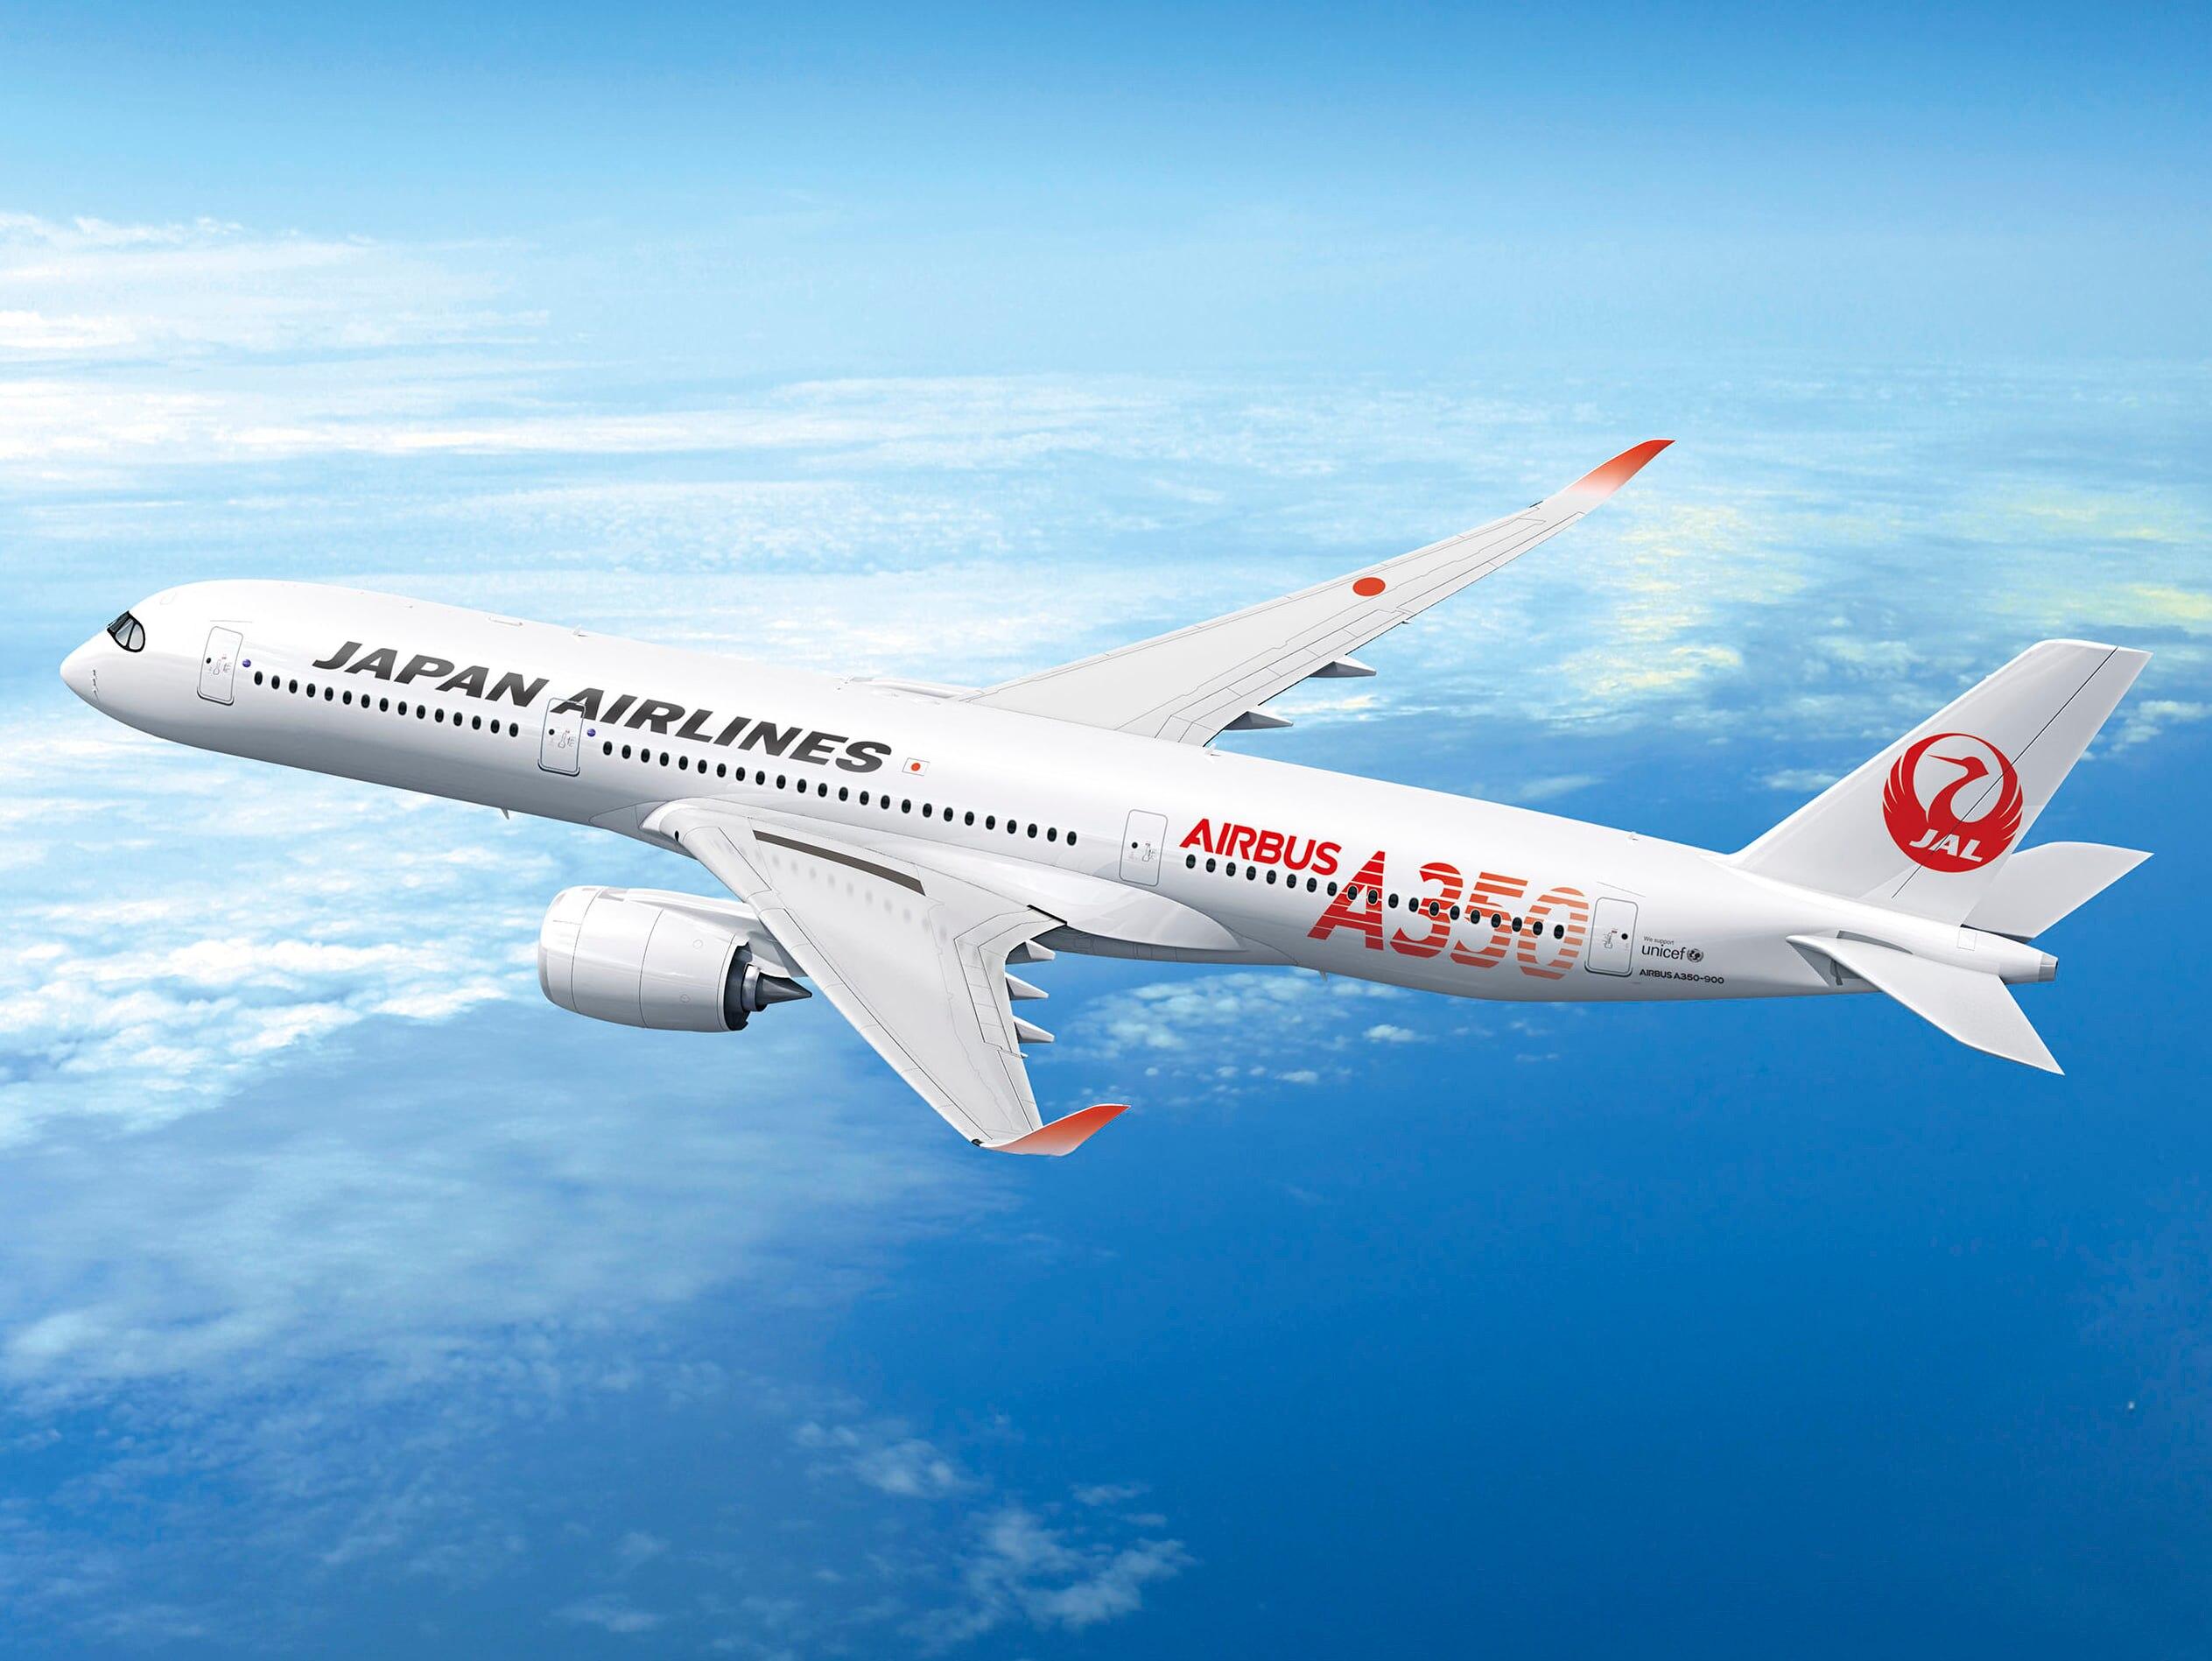 「JAL」の画像検索結果